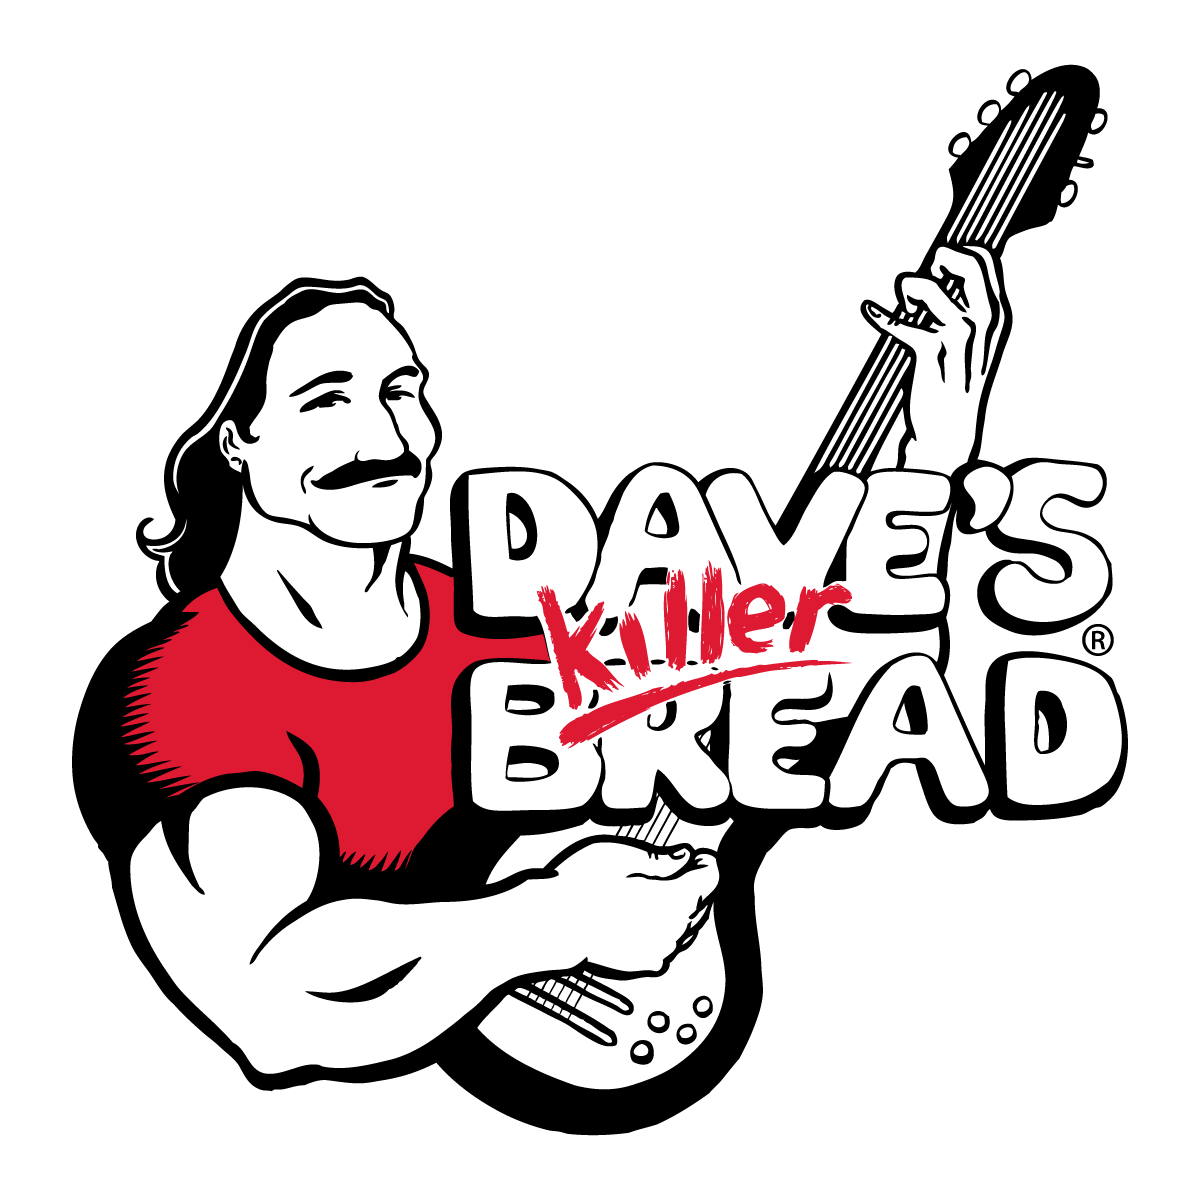 Clipart bread raisin bread. Dave s killer harvest